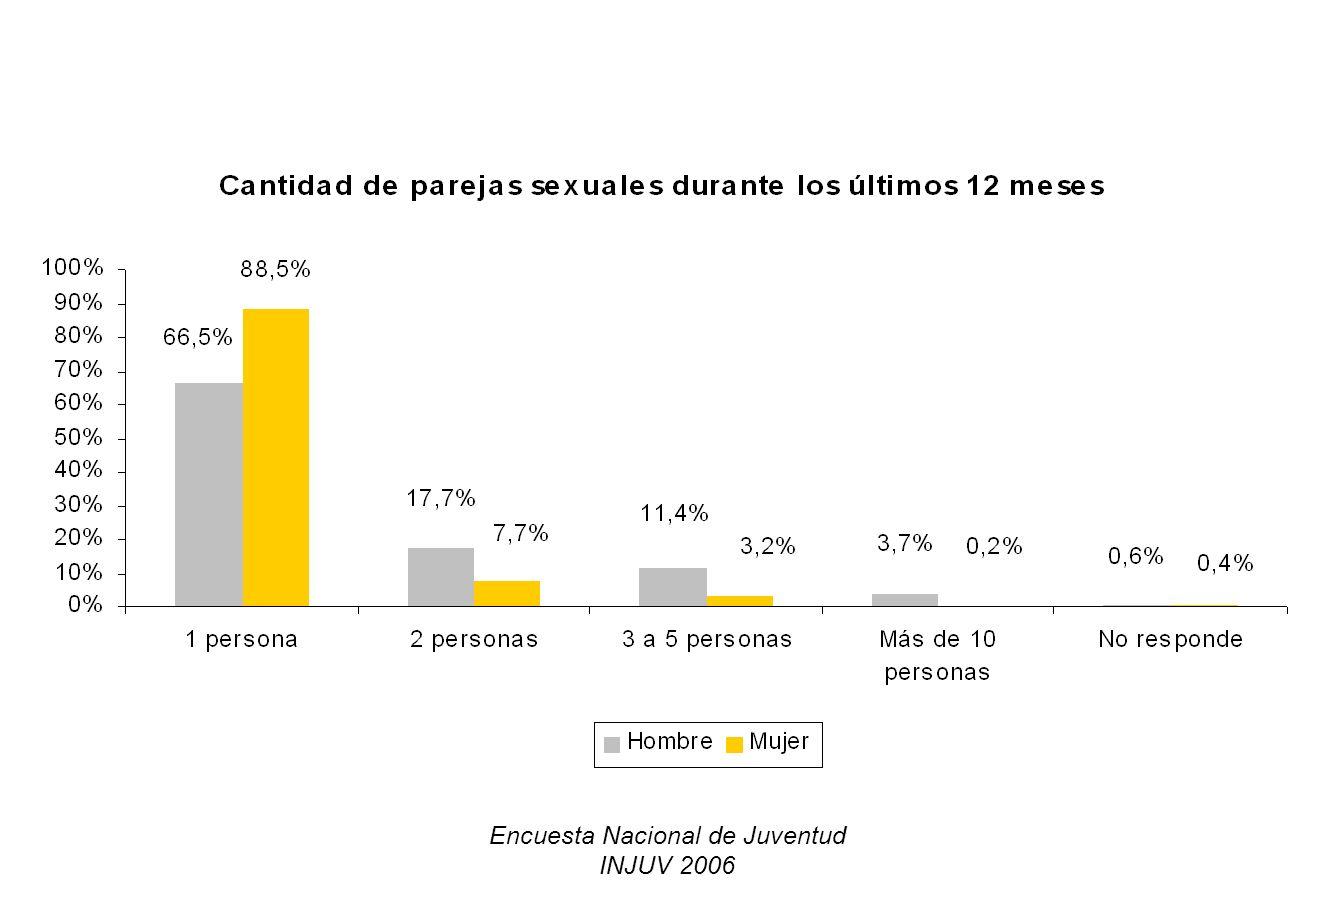 Encuesta Nacional de Juventud INJUV 2006